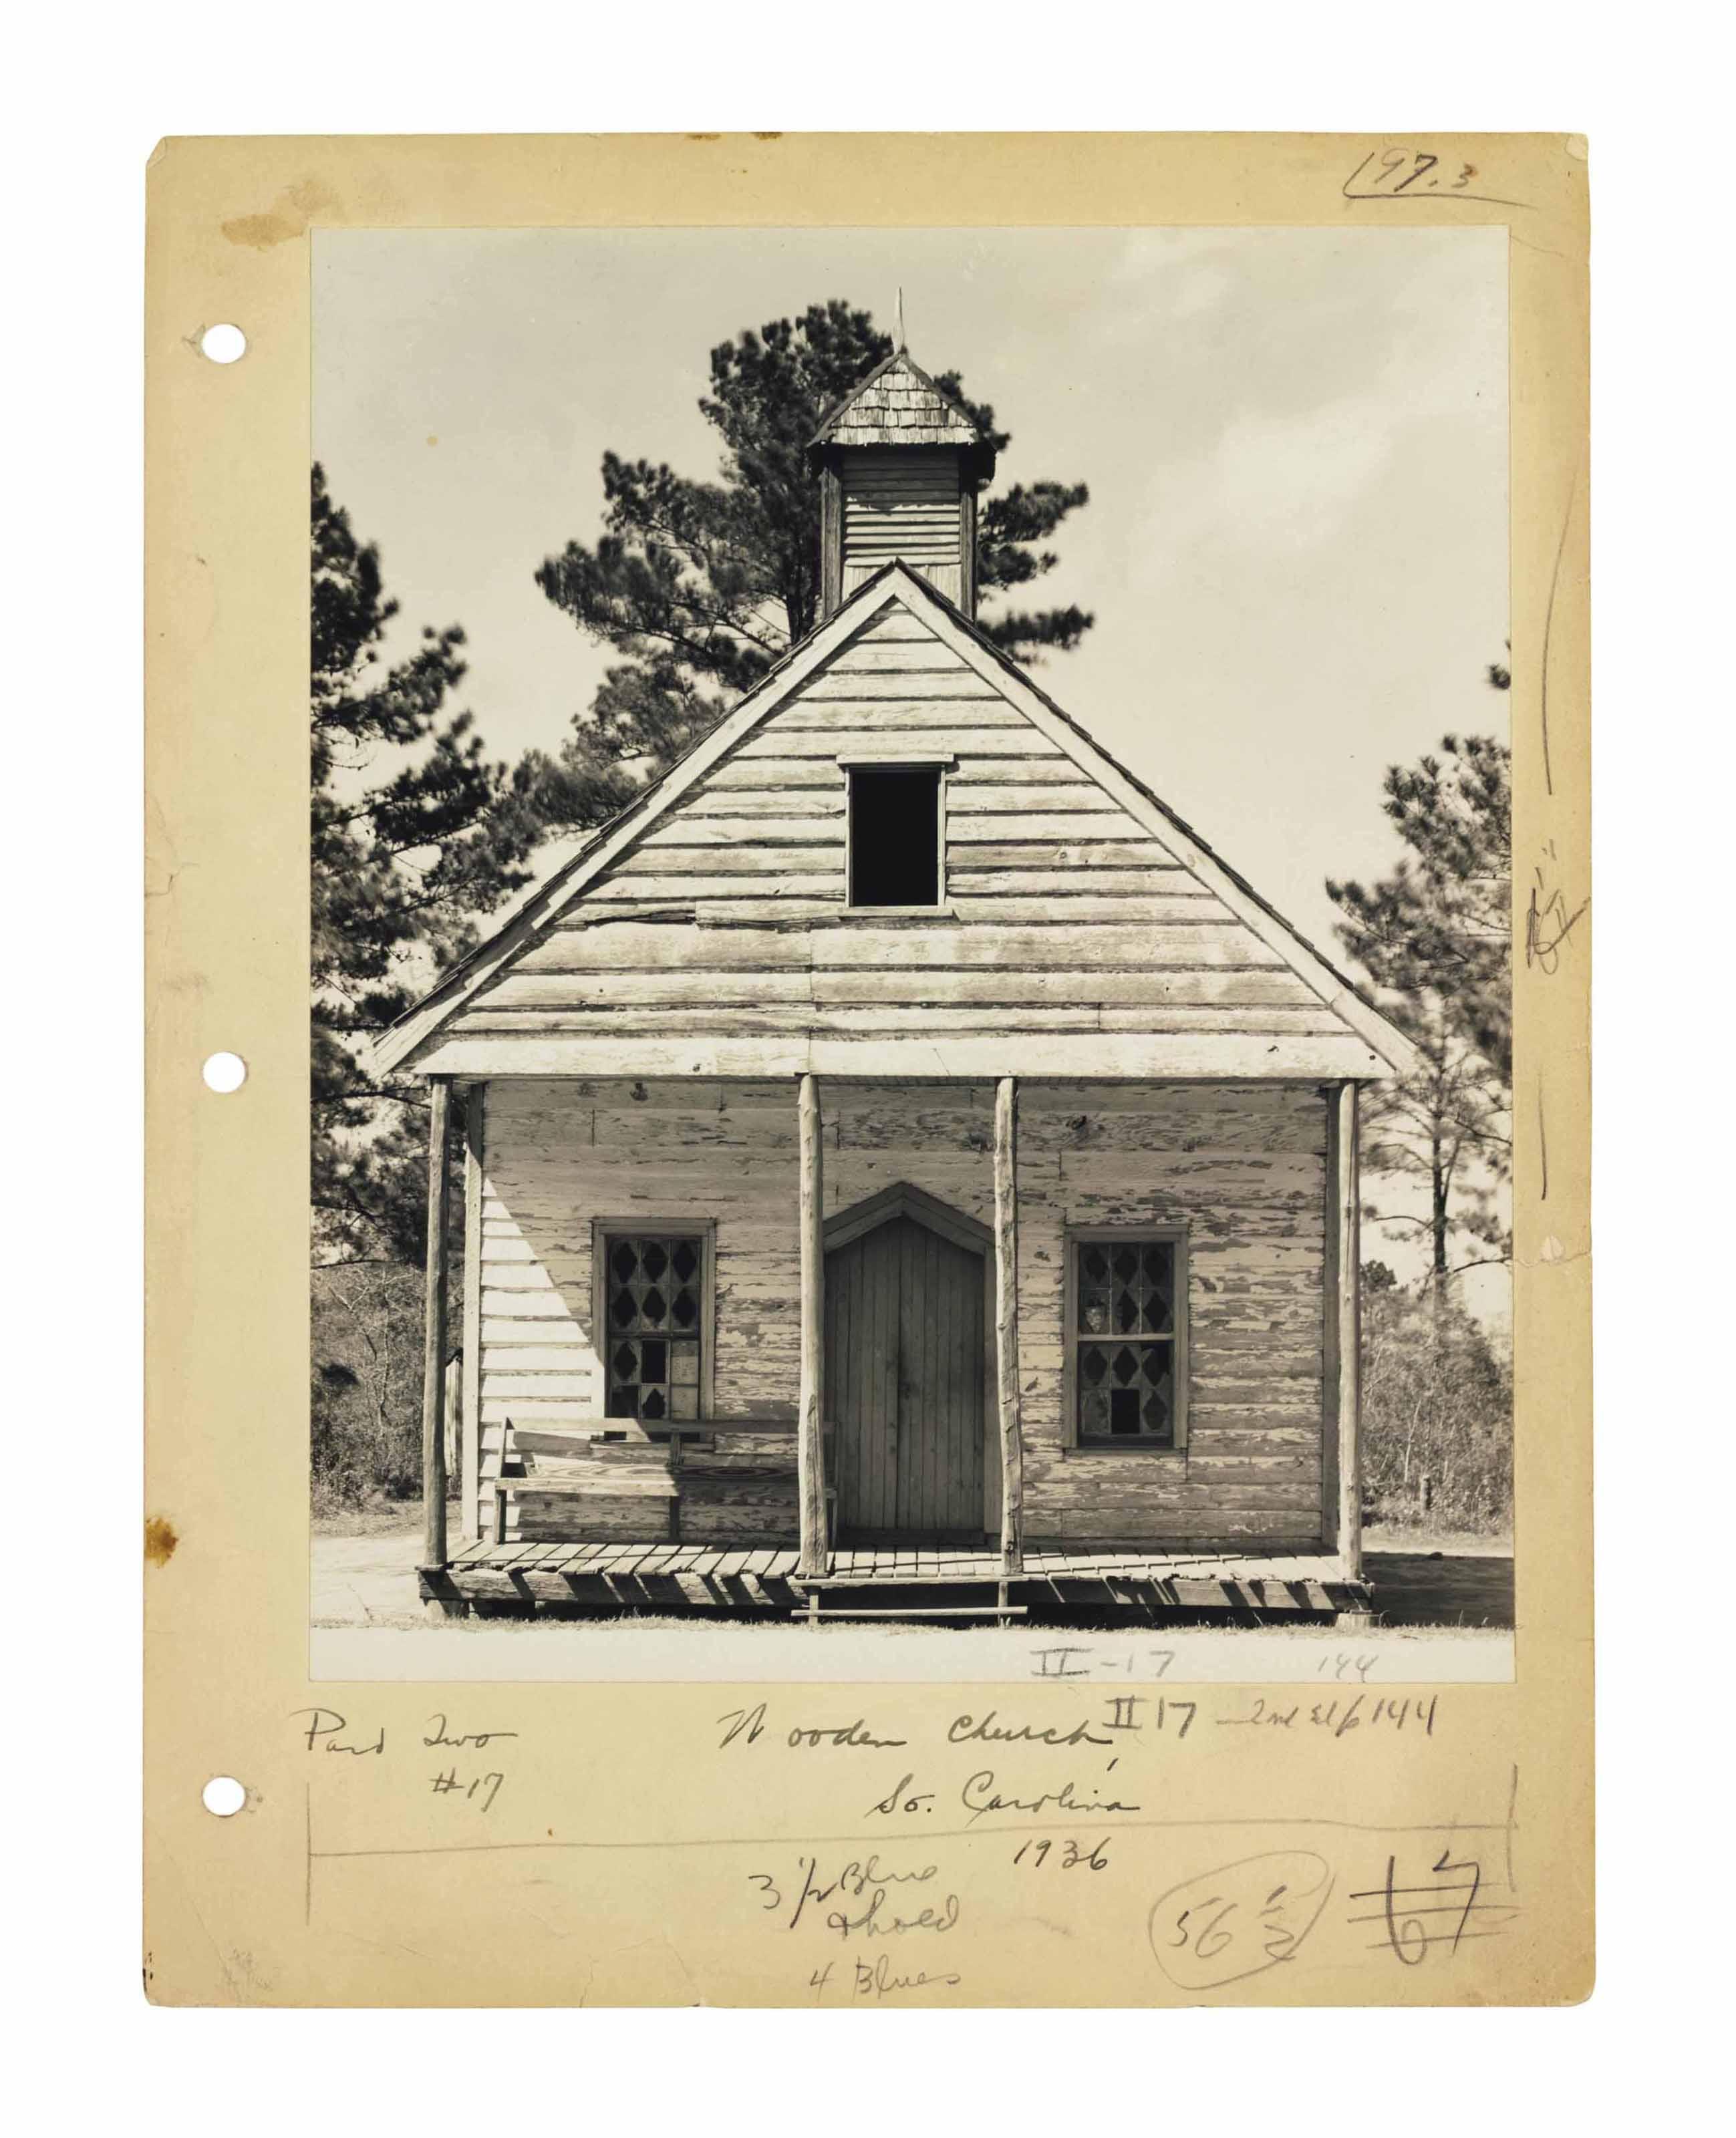 Wooden Church, South Carolina, 1936